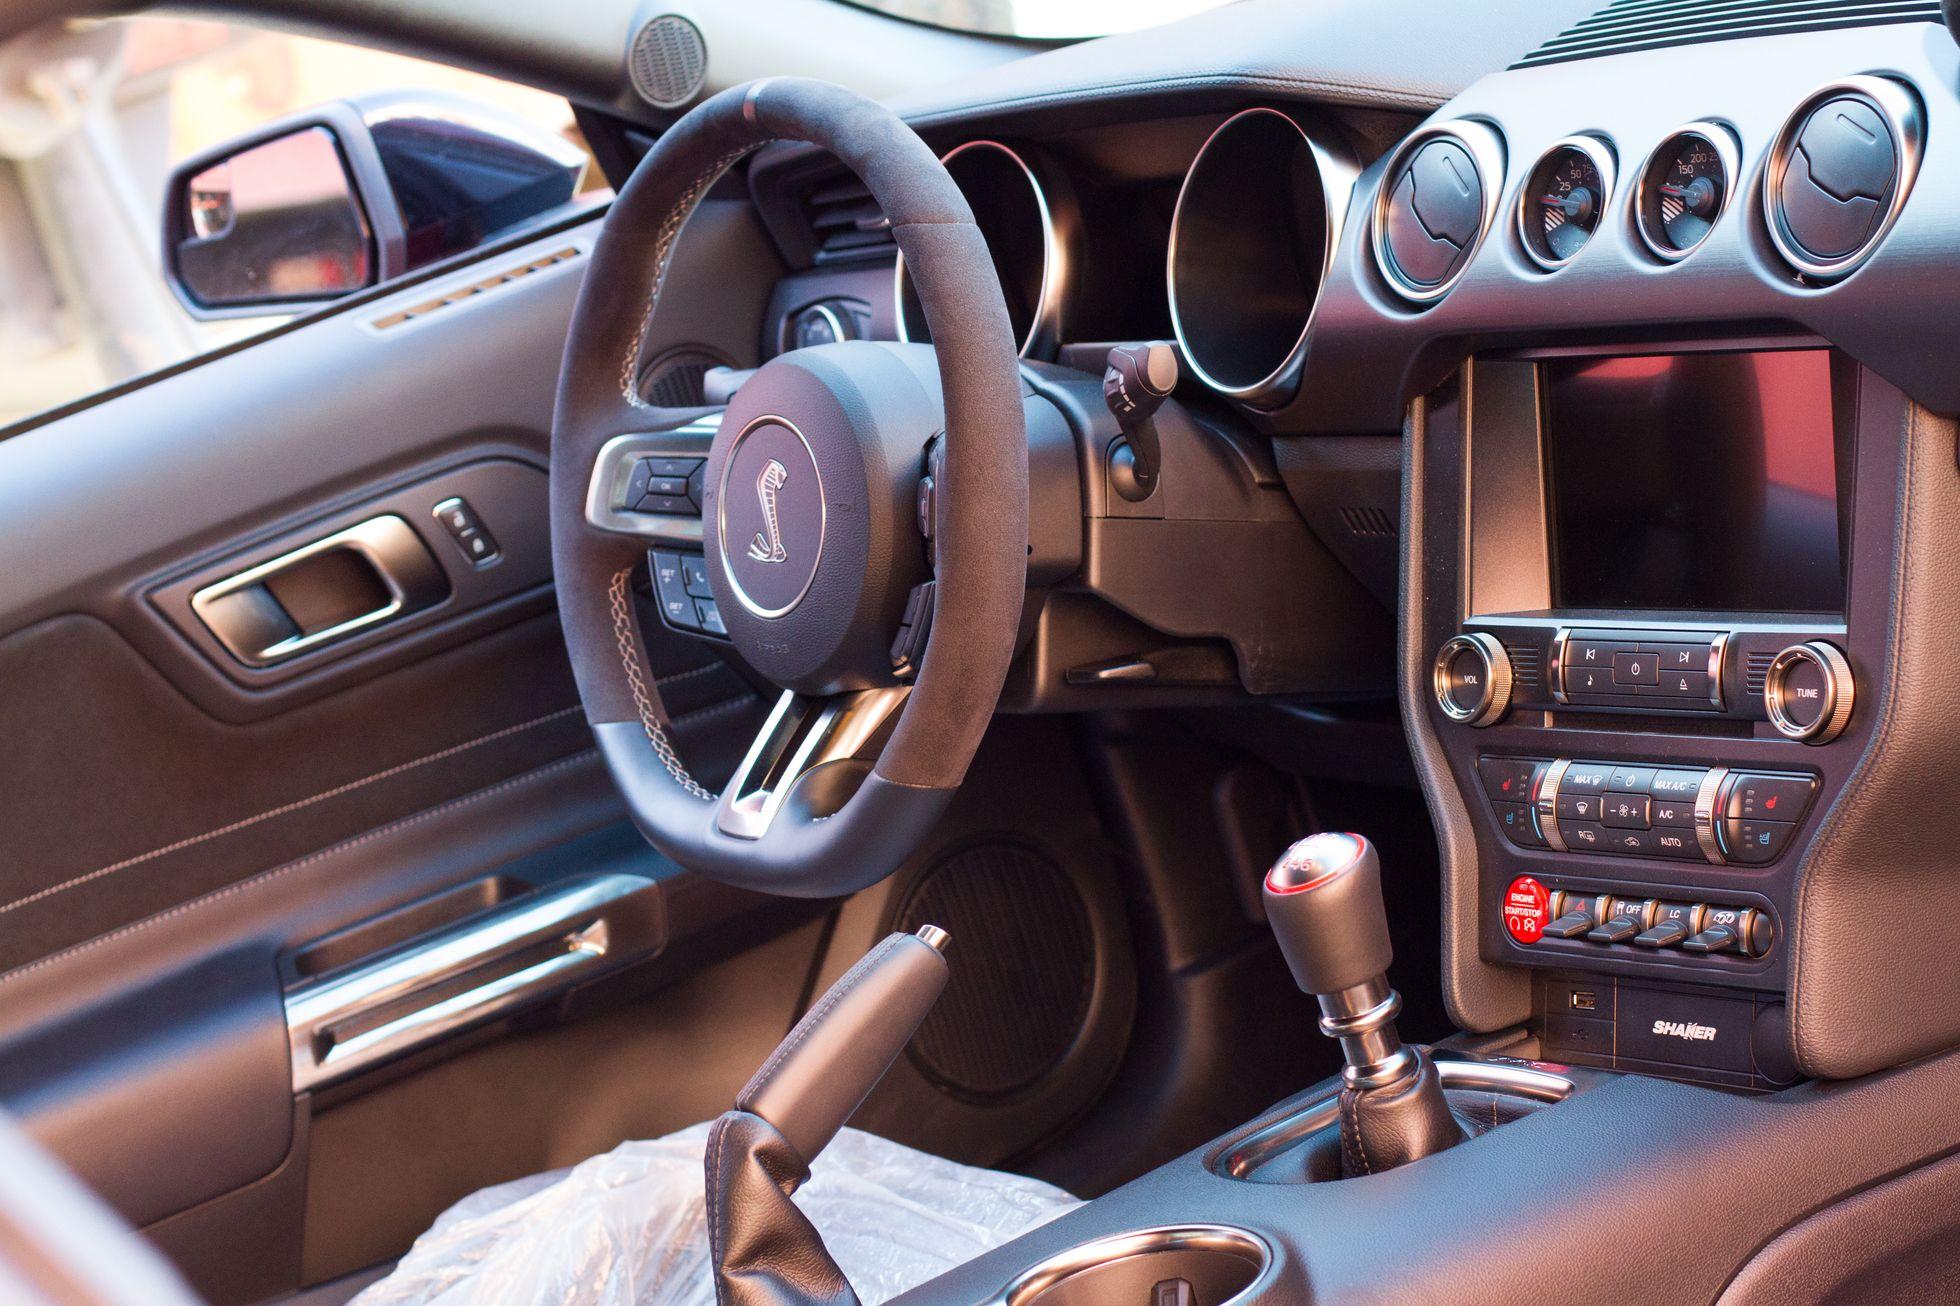 GT350 Shelby interior